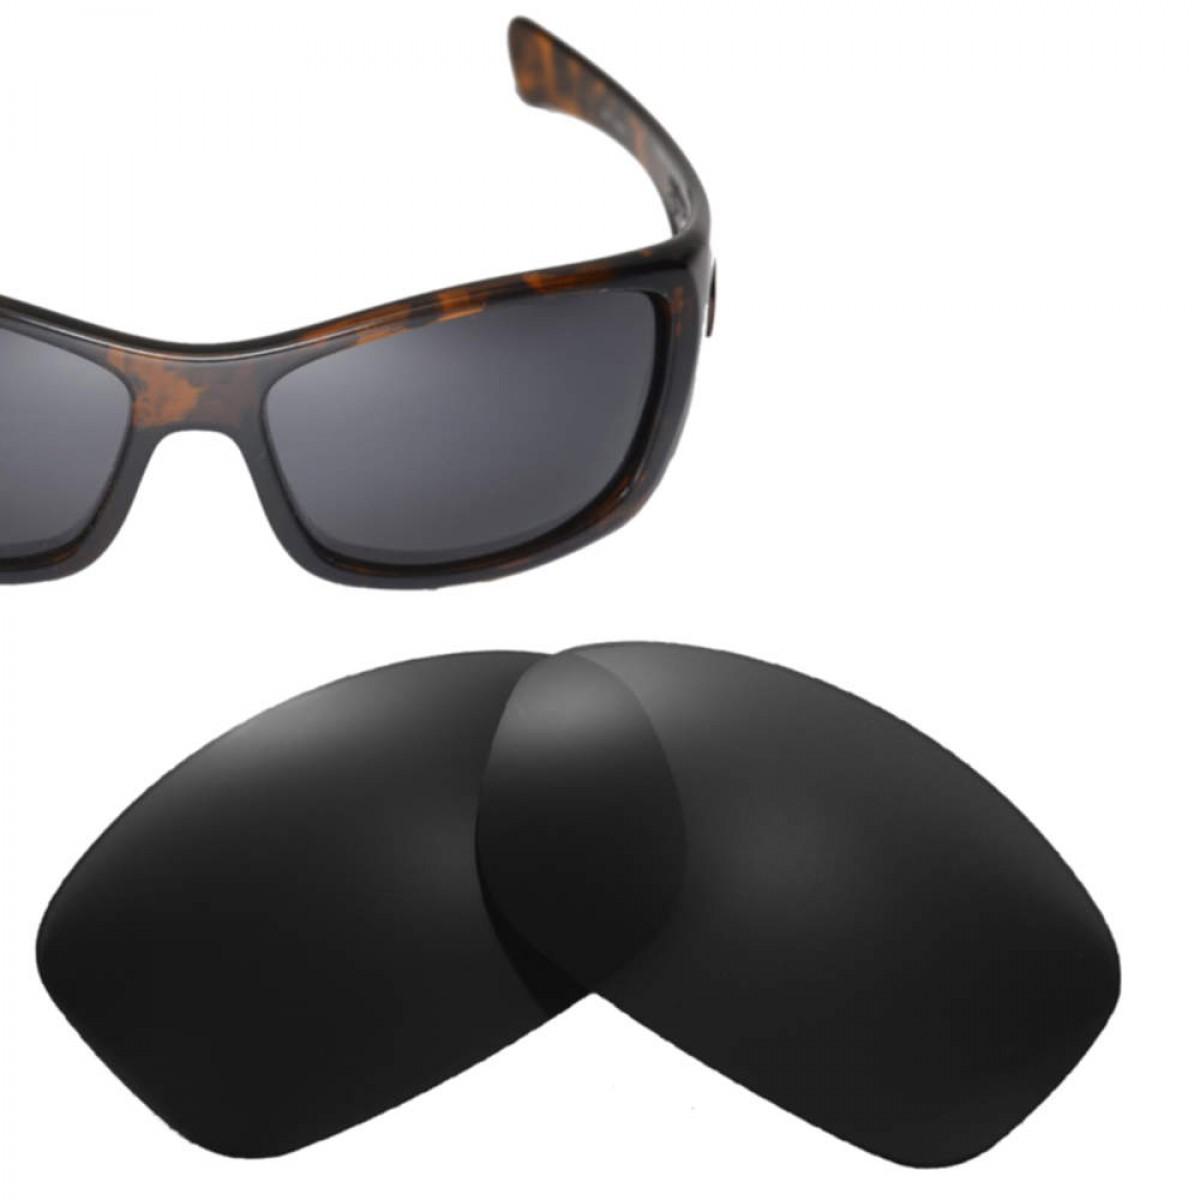 fc7b7904ca4 Cofery Lenses Store Cofery Replacement Lenses for Oakley Hijinx Sunglasses